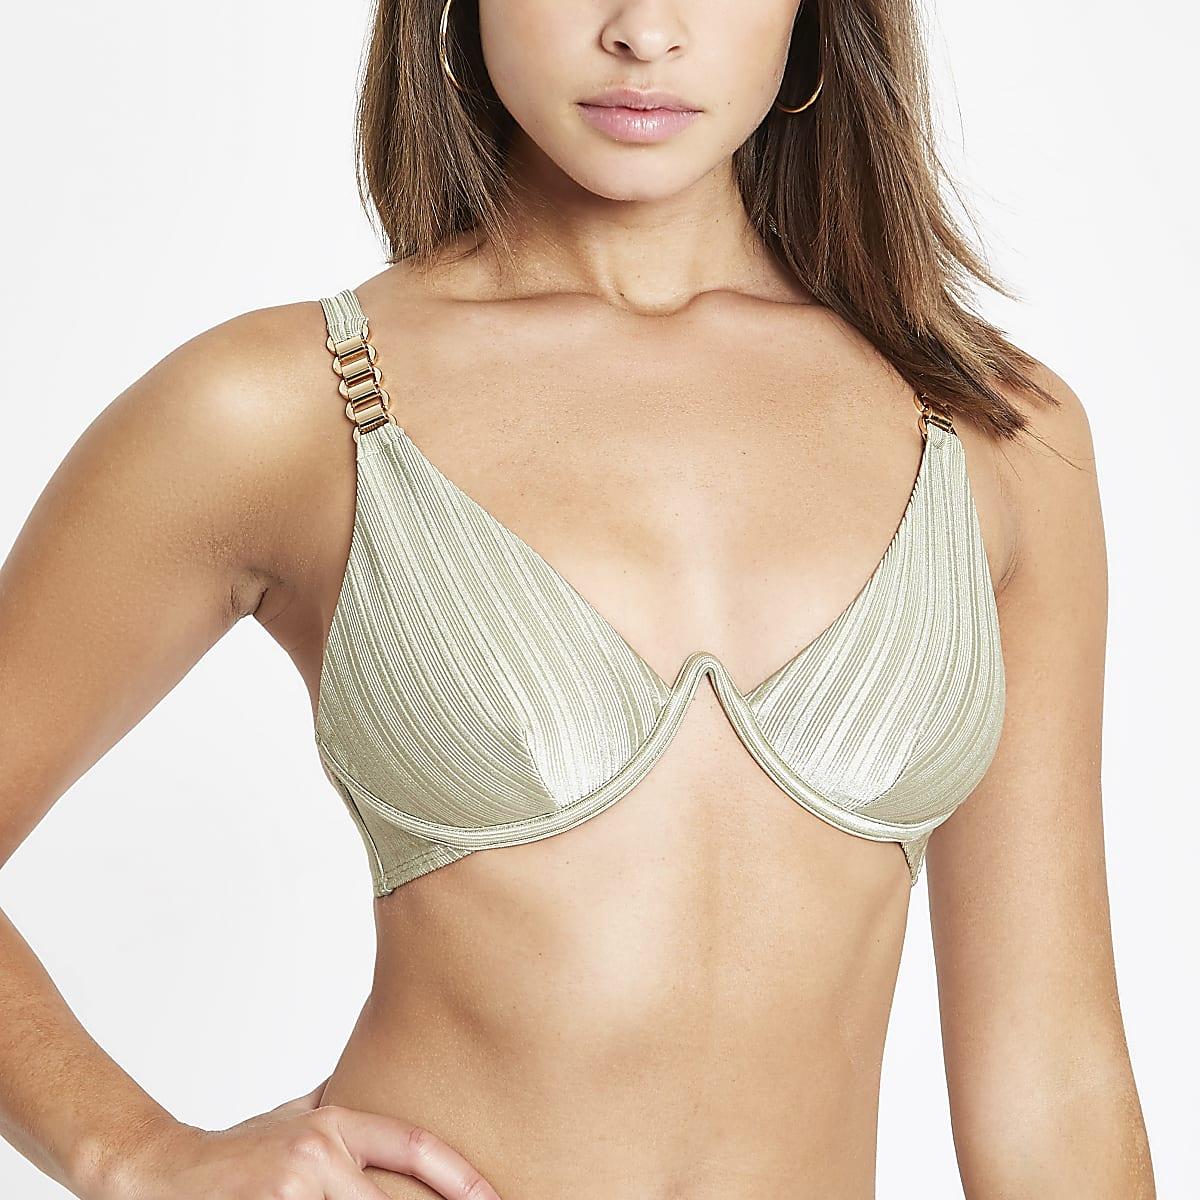 Kaki geribbelde bikinitop met beugel en ketting